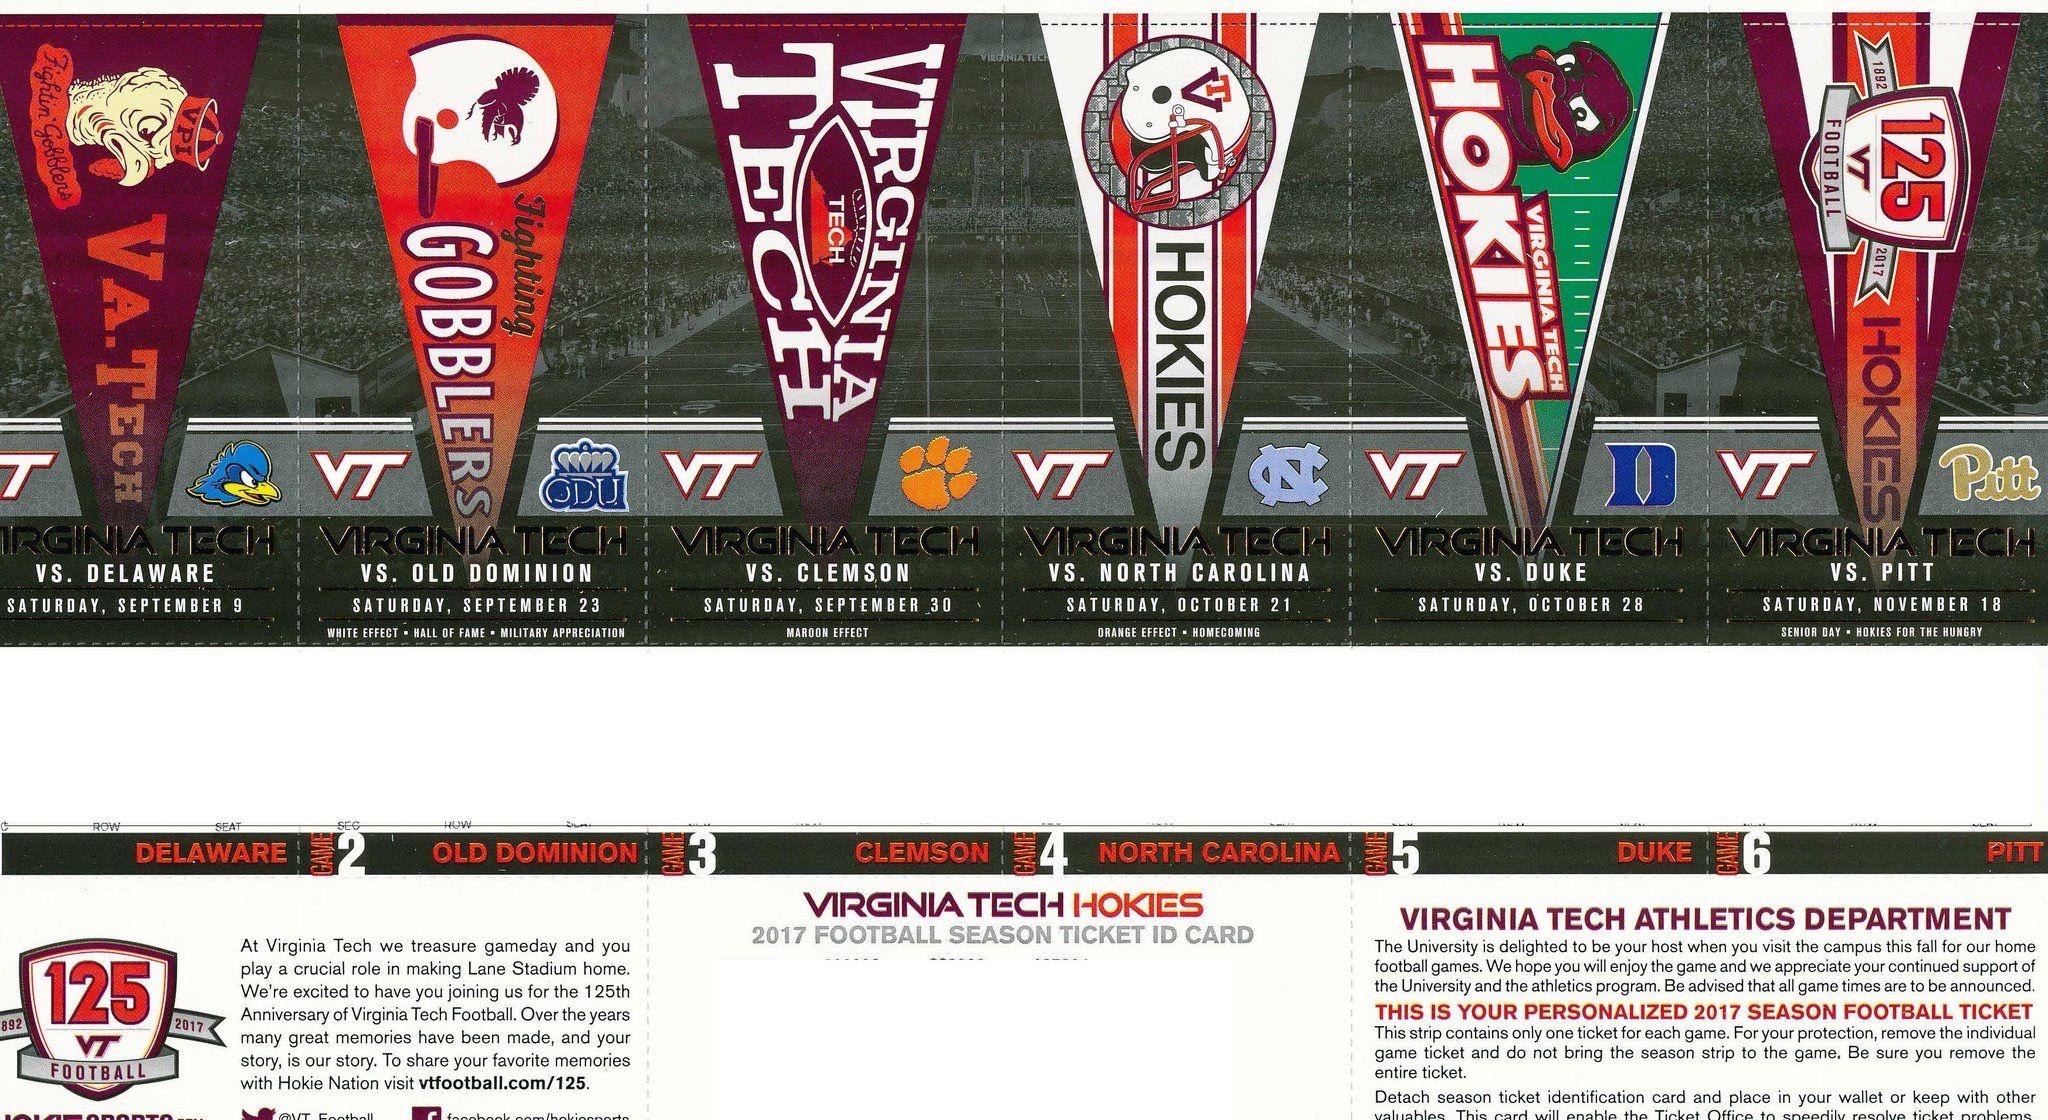 2017 football tickets! Sweet!! Virginia tech football